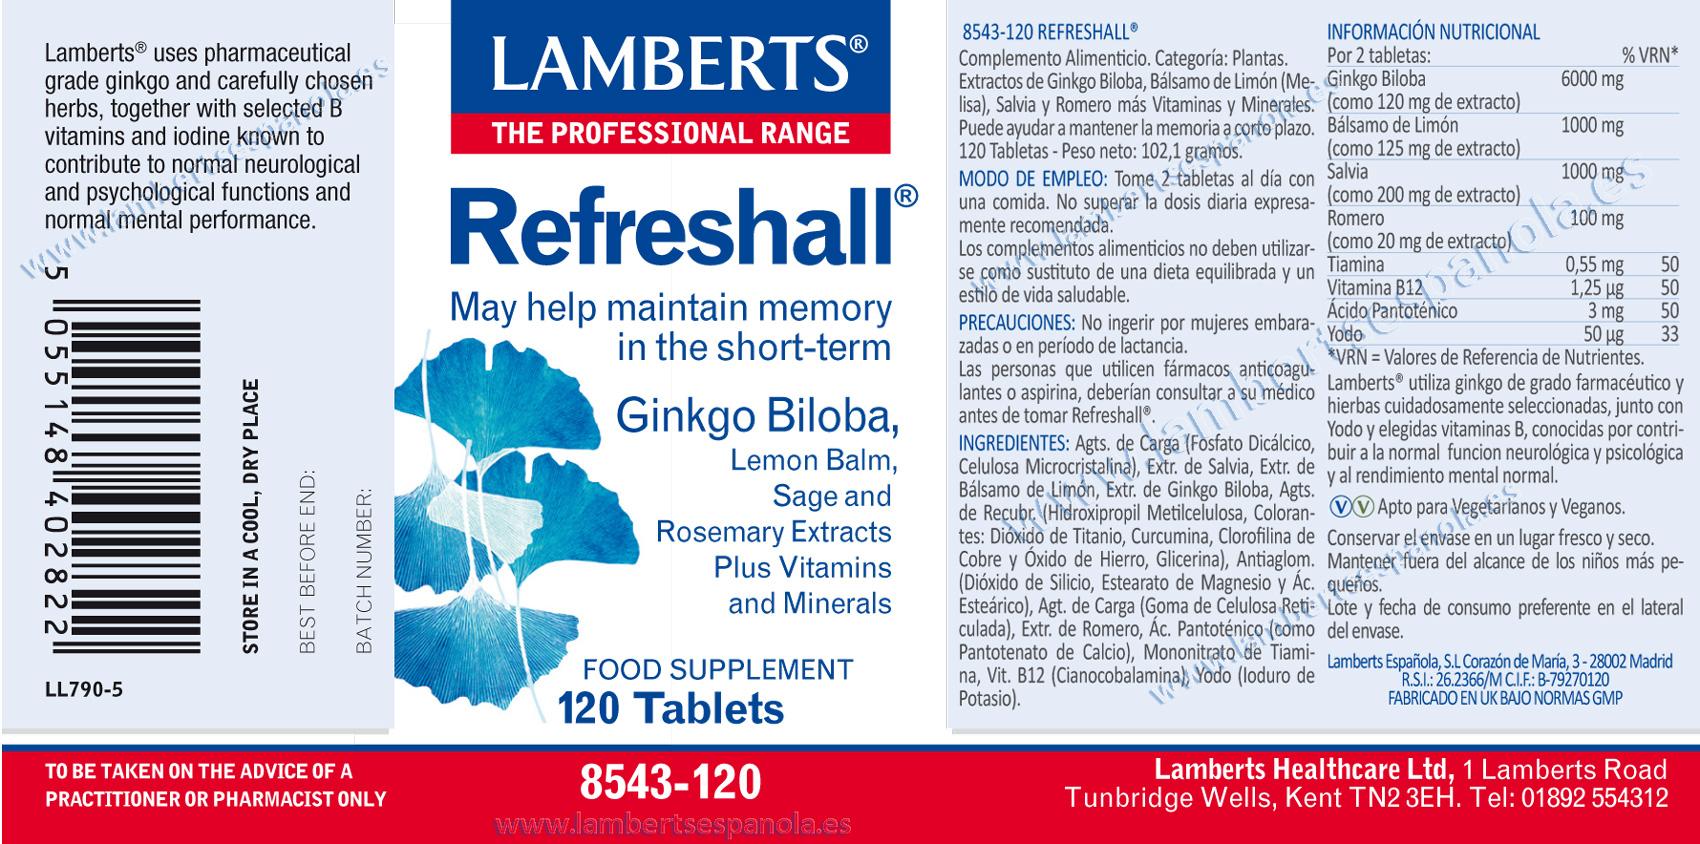 Refreshall (Memoria corto plazo)